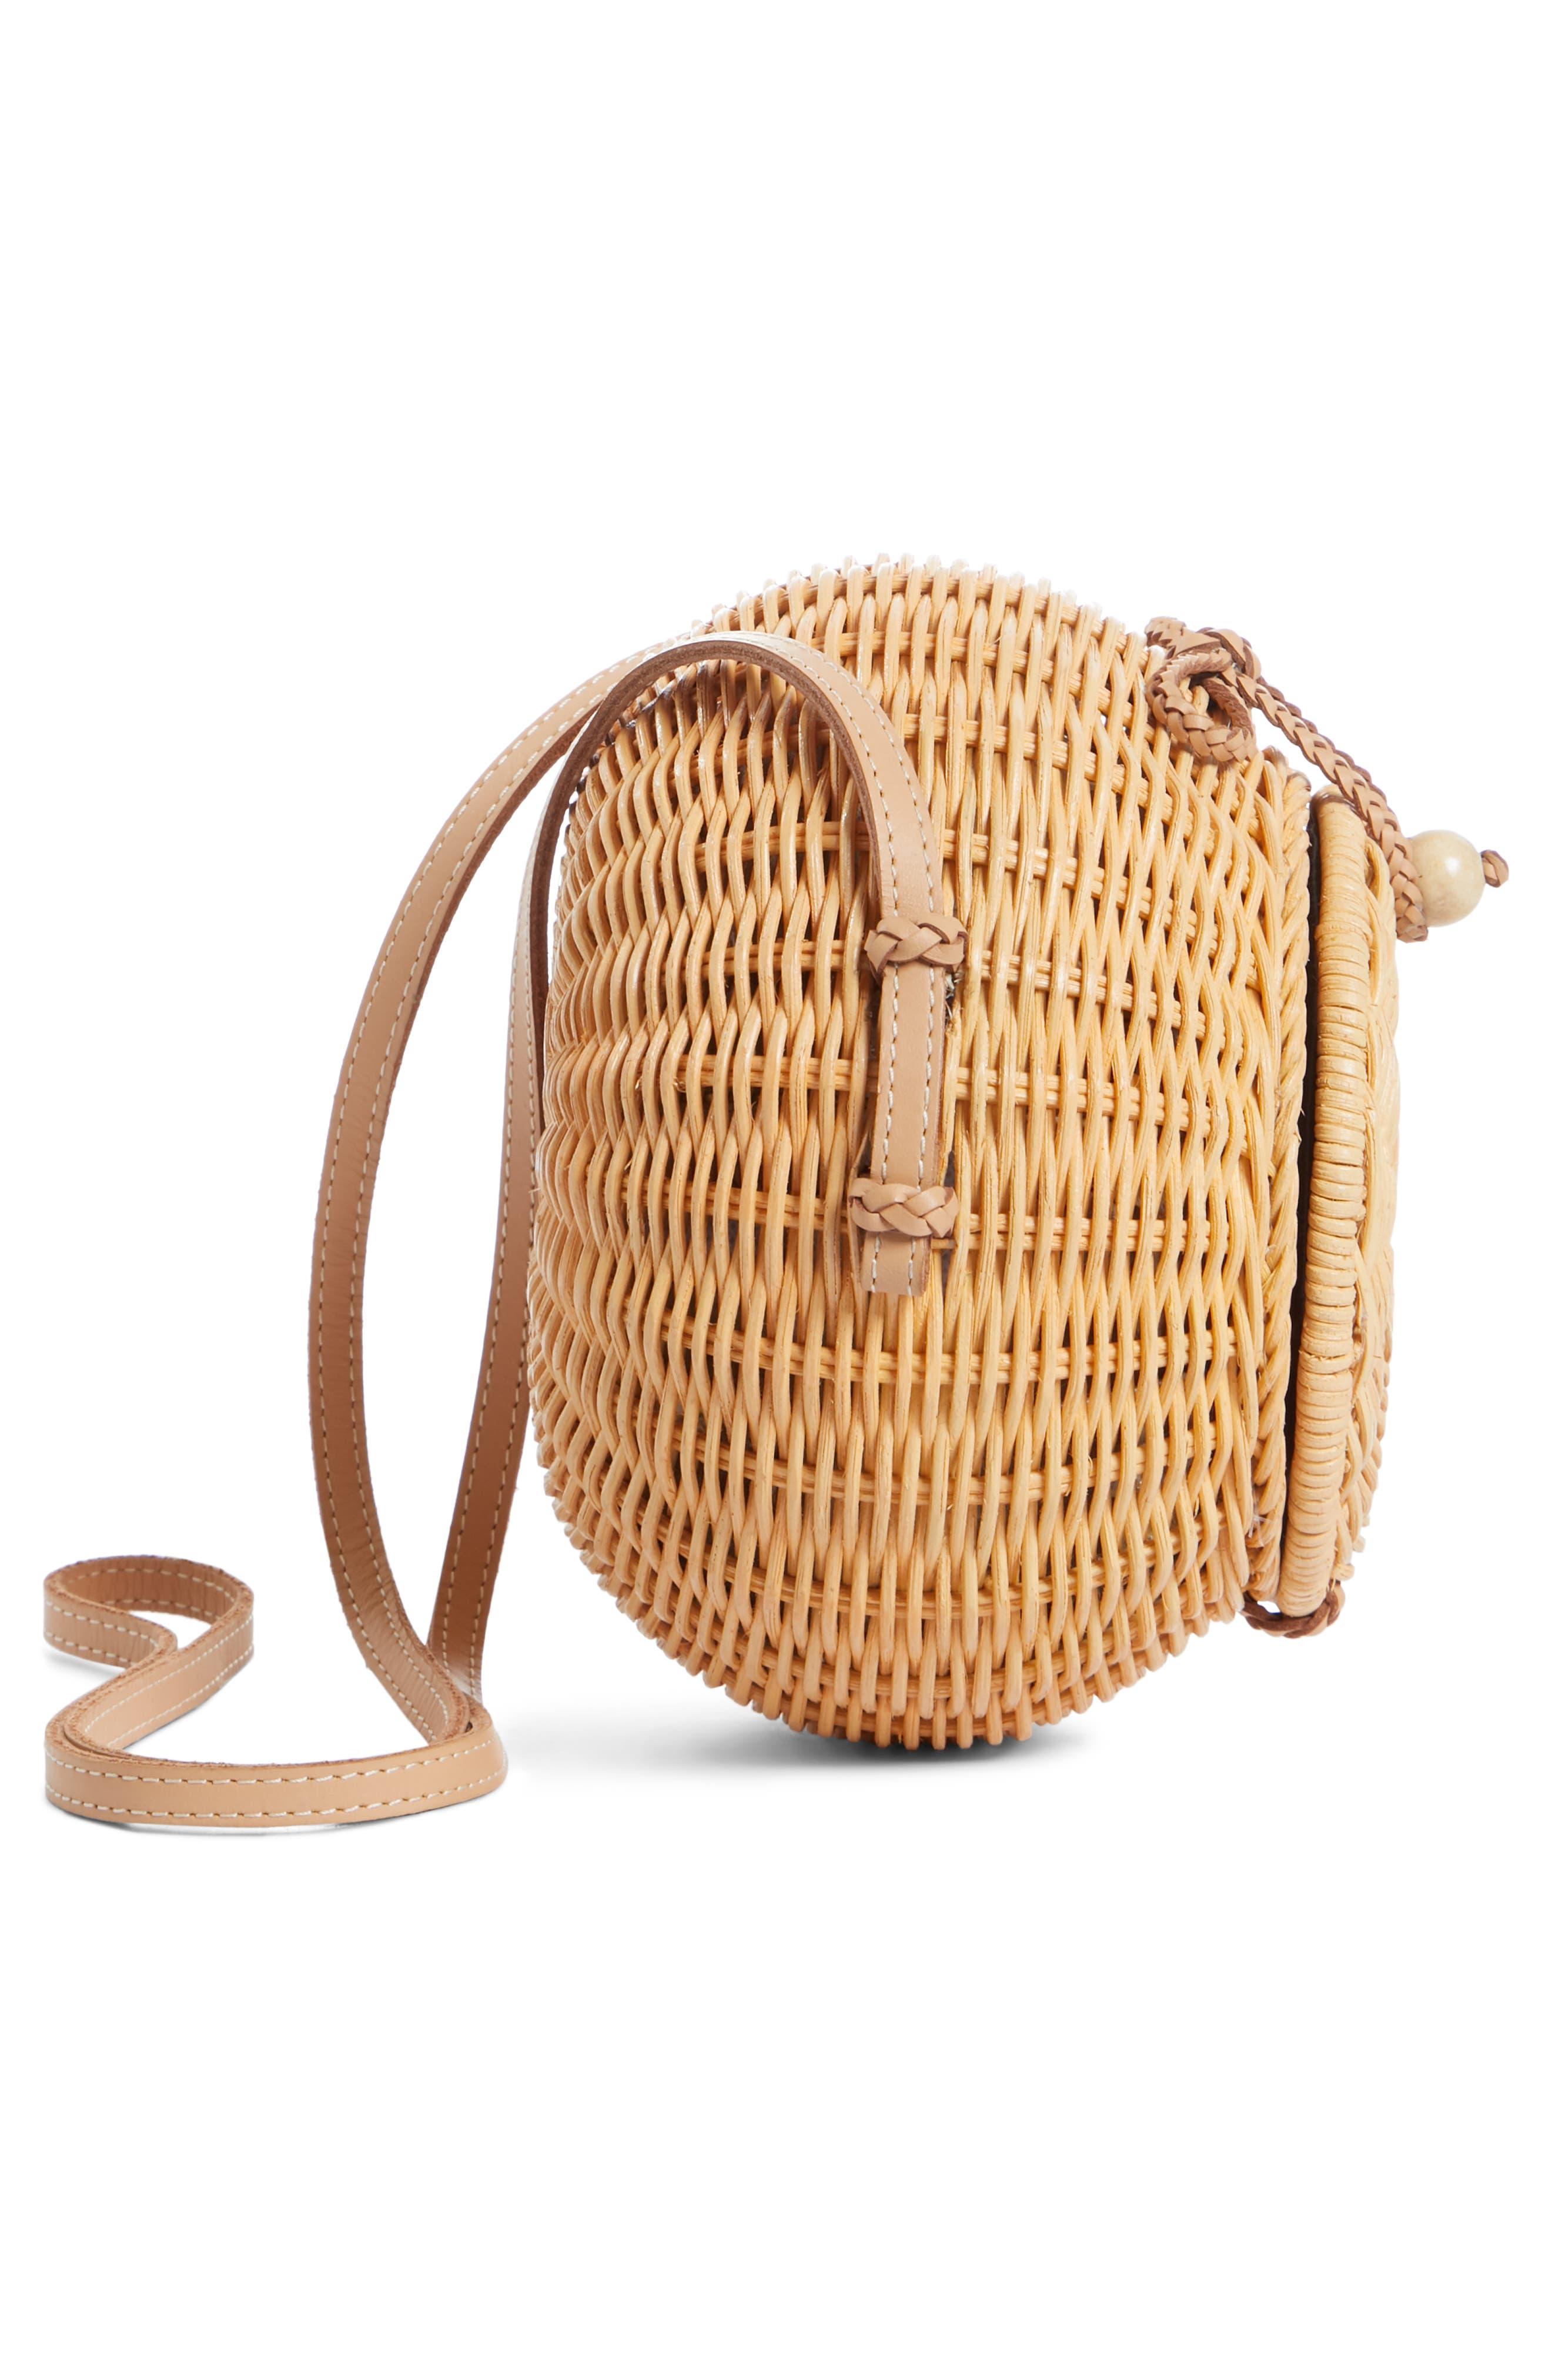 ULLA JOHNSON,                             Pomme Woven Rattan Shoulder Bag,                             Alternate thumbnail 5, color,                             NATURAL